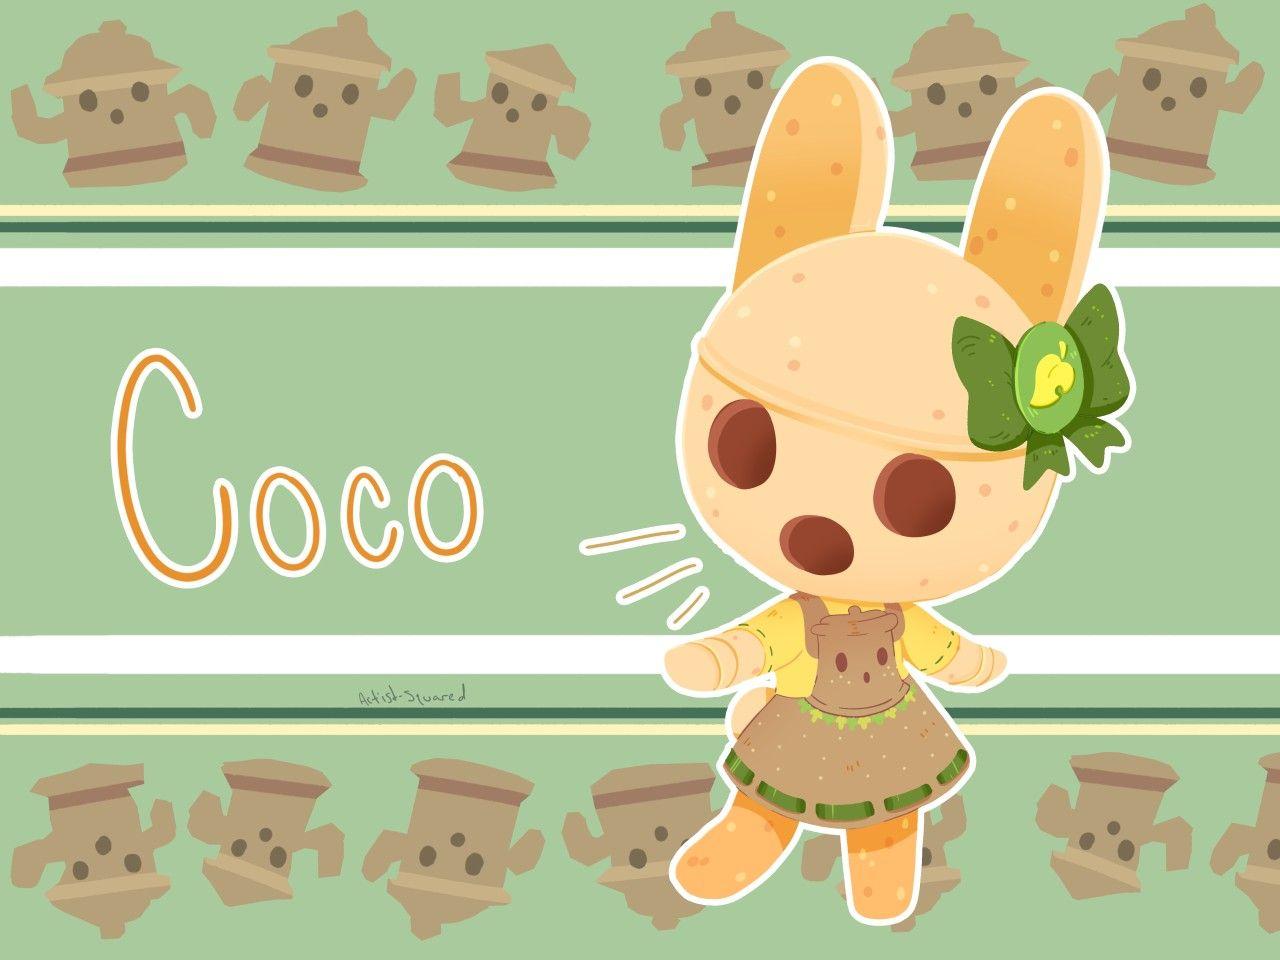 17+ Coco animal crossing amiibo ideas in 2021